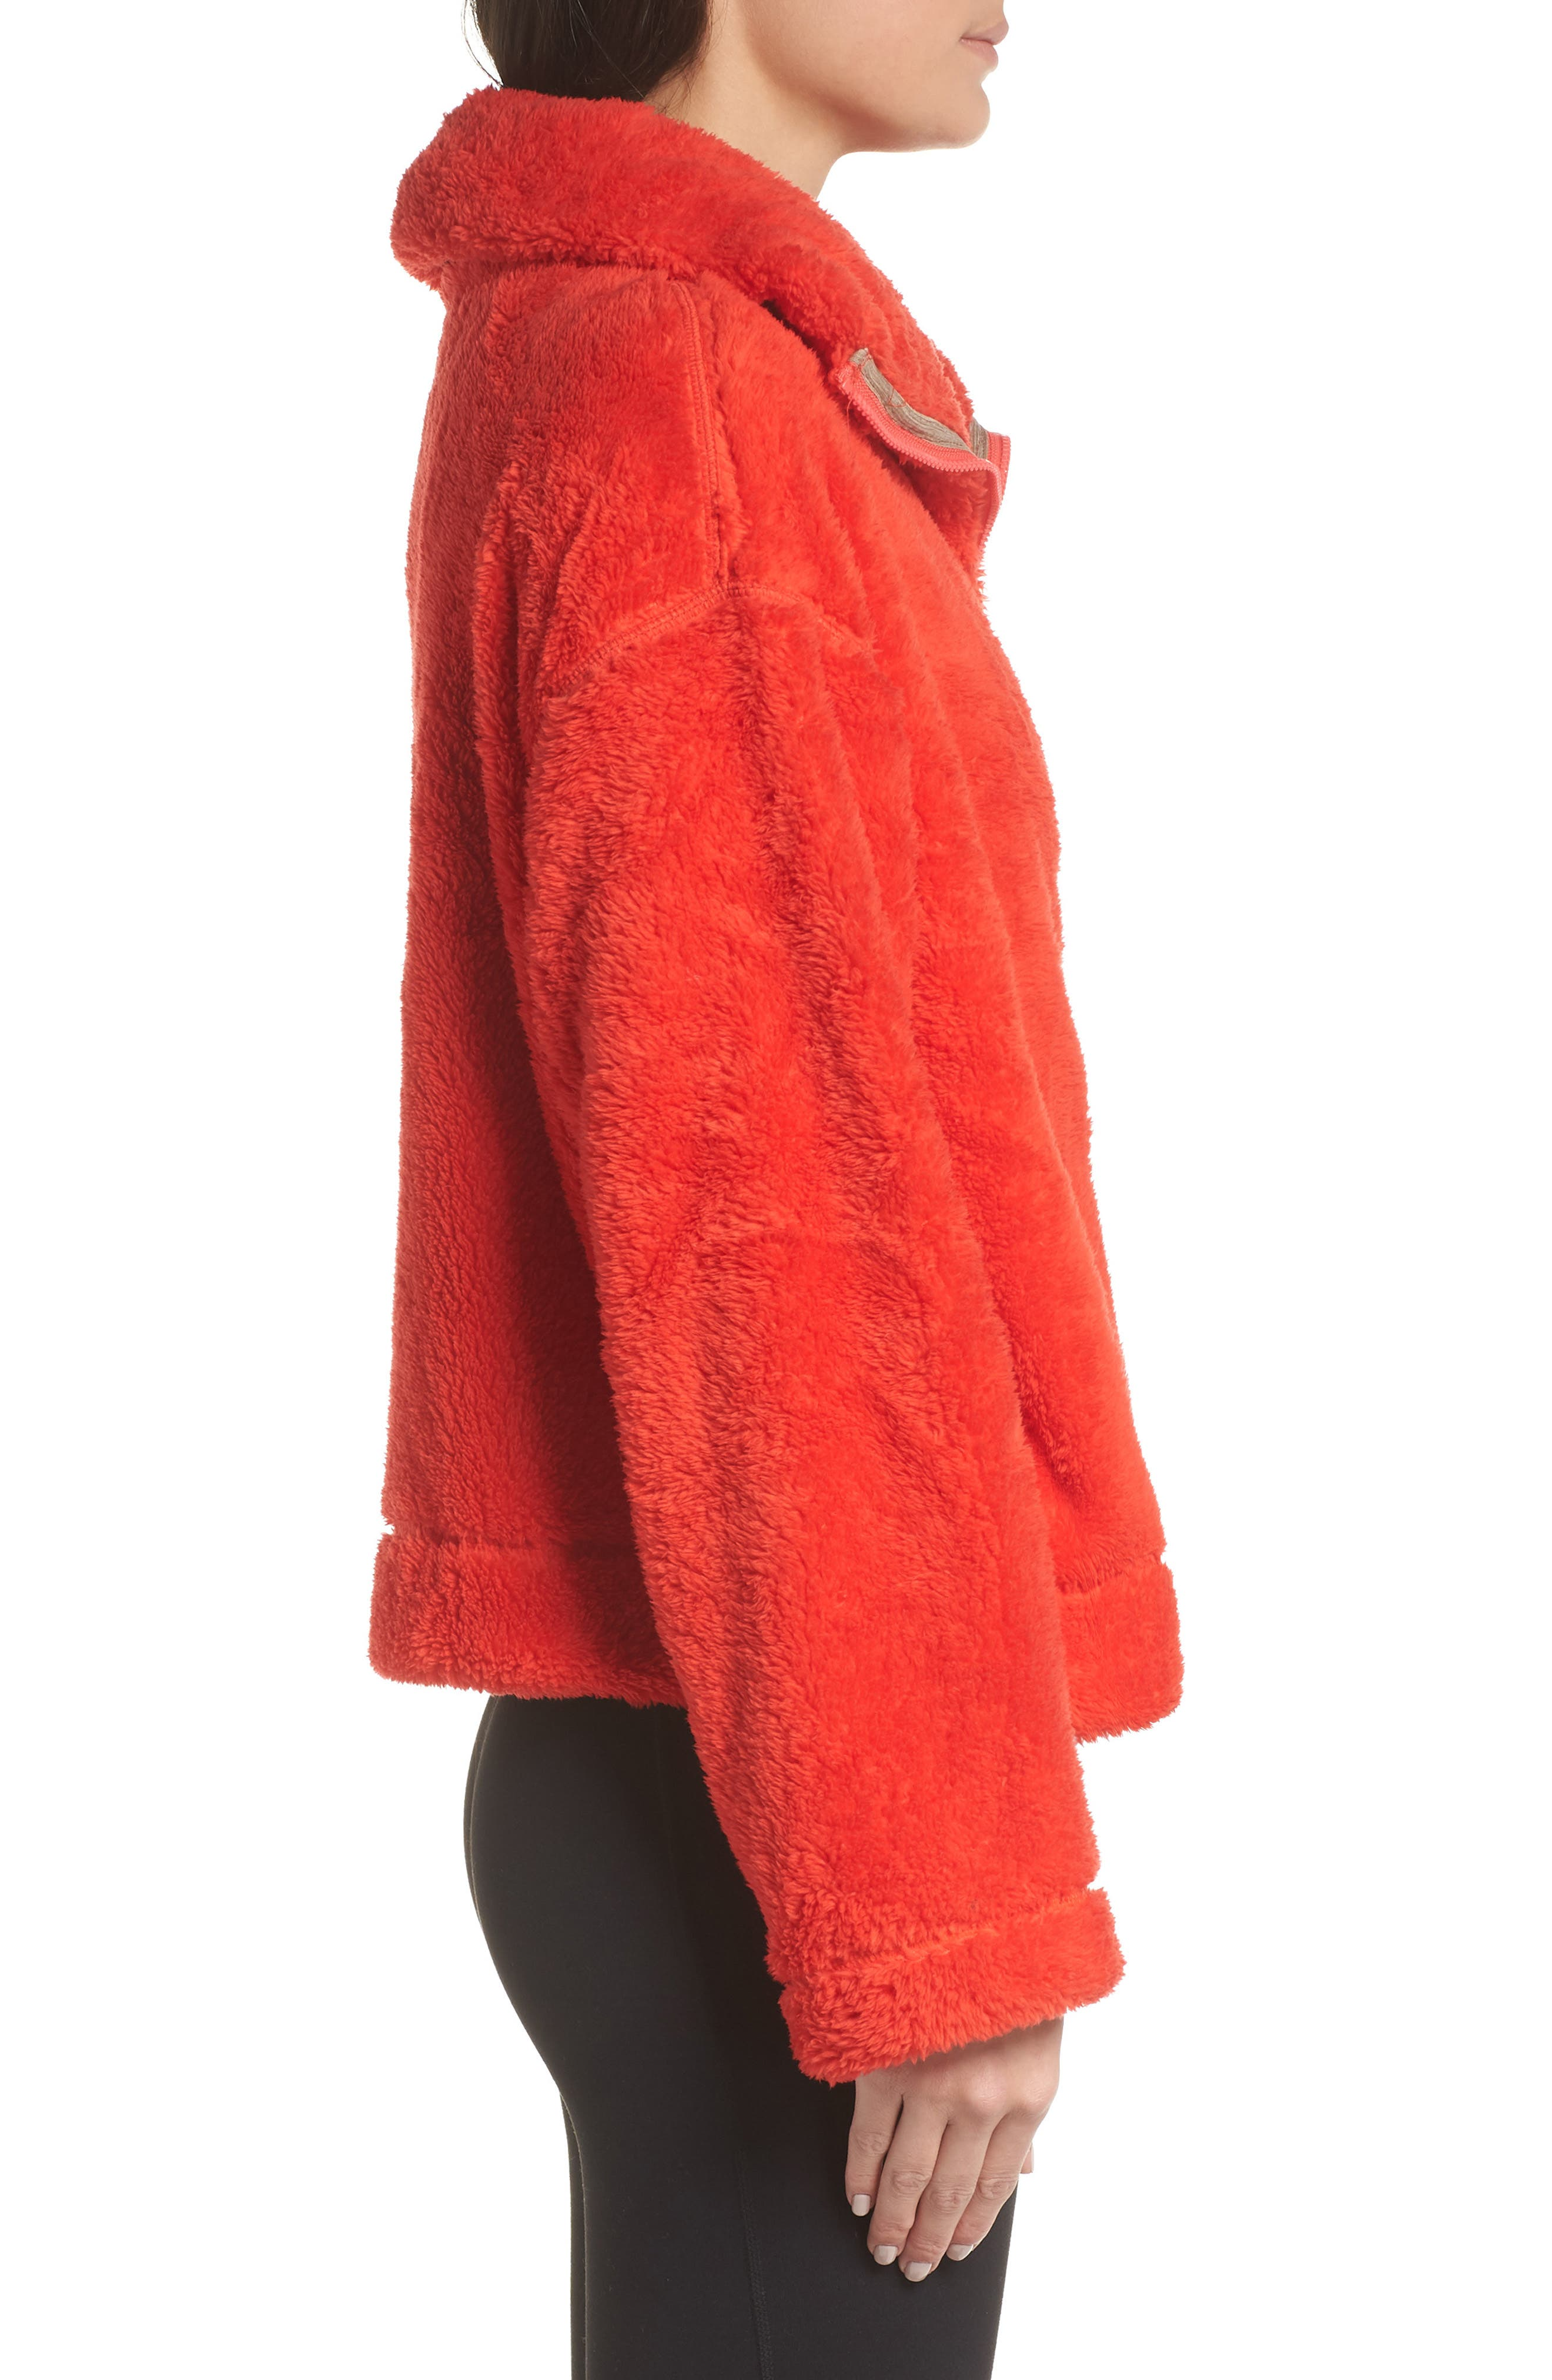 Dazed Fleece Jacket,                             Alternate thumbnail 3, color,                             RED